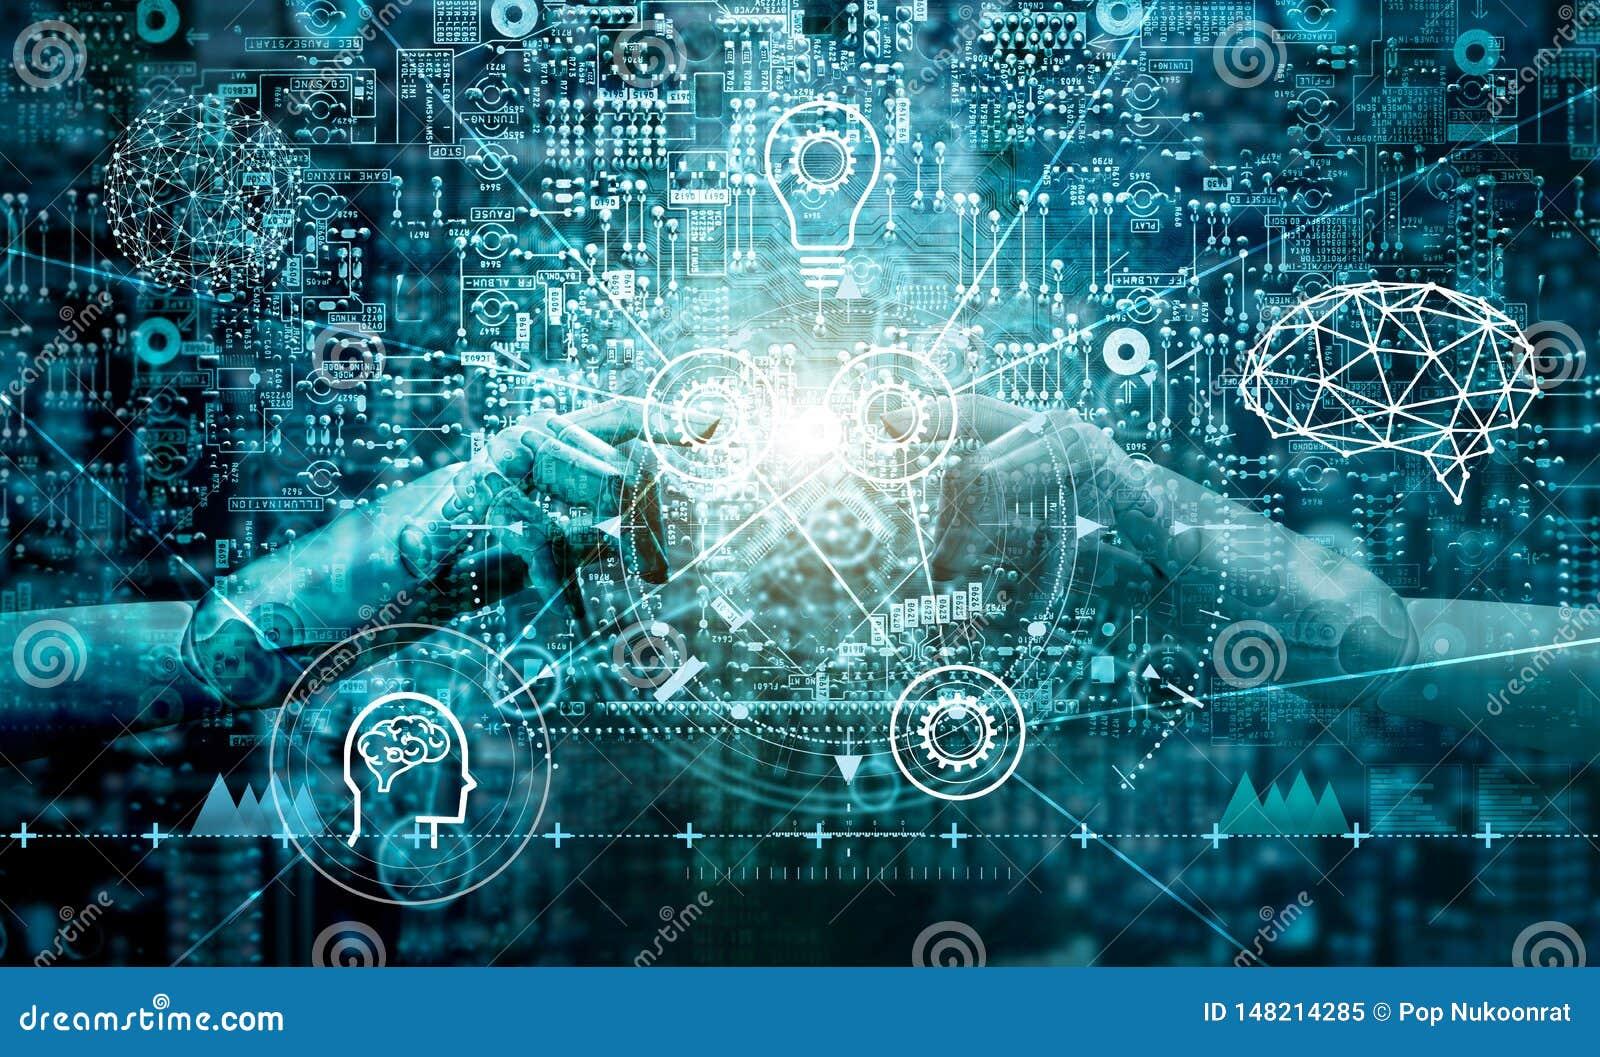 Hand of robots touching on binary data. Futuristic Artificial intelligence AI.